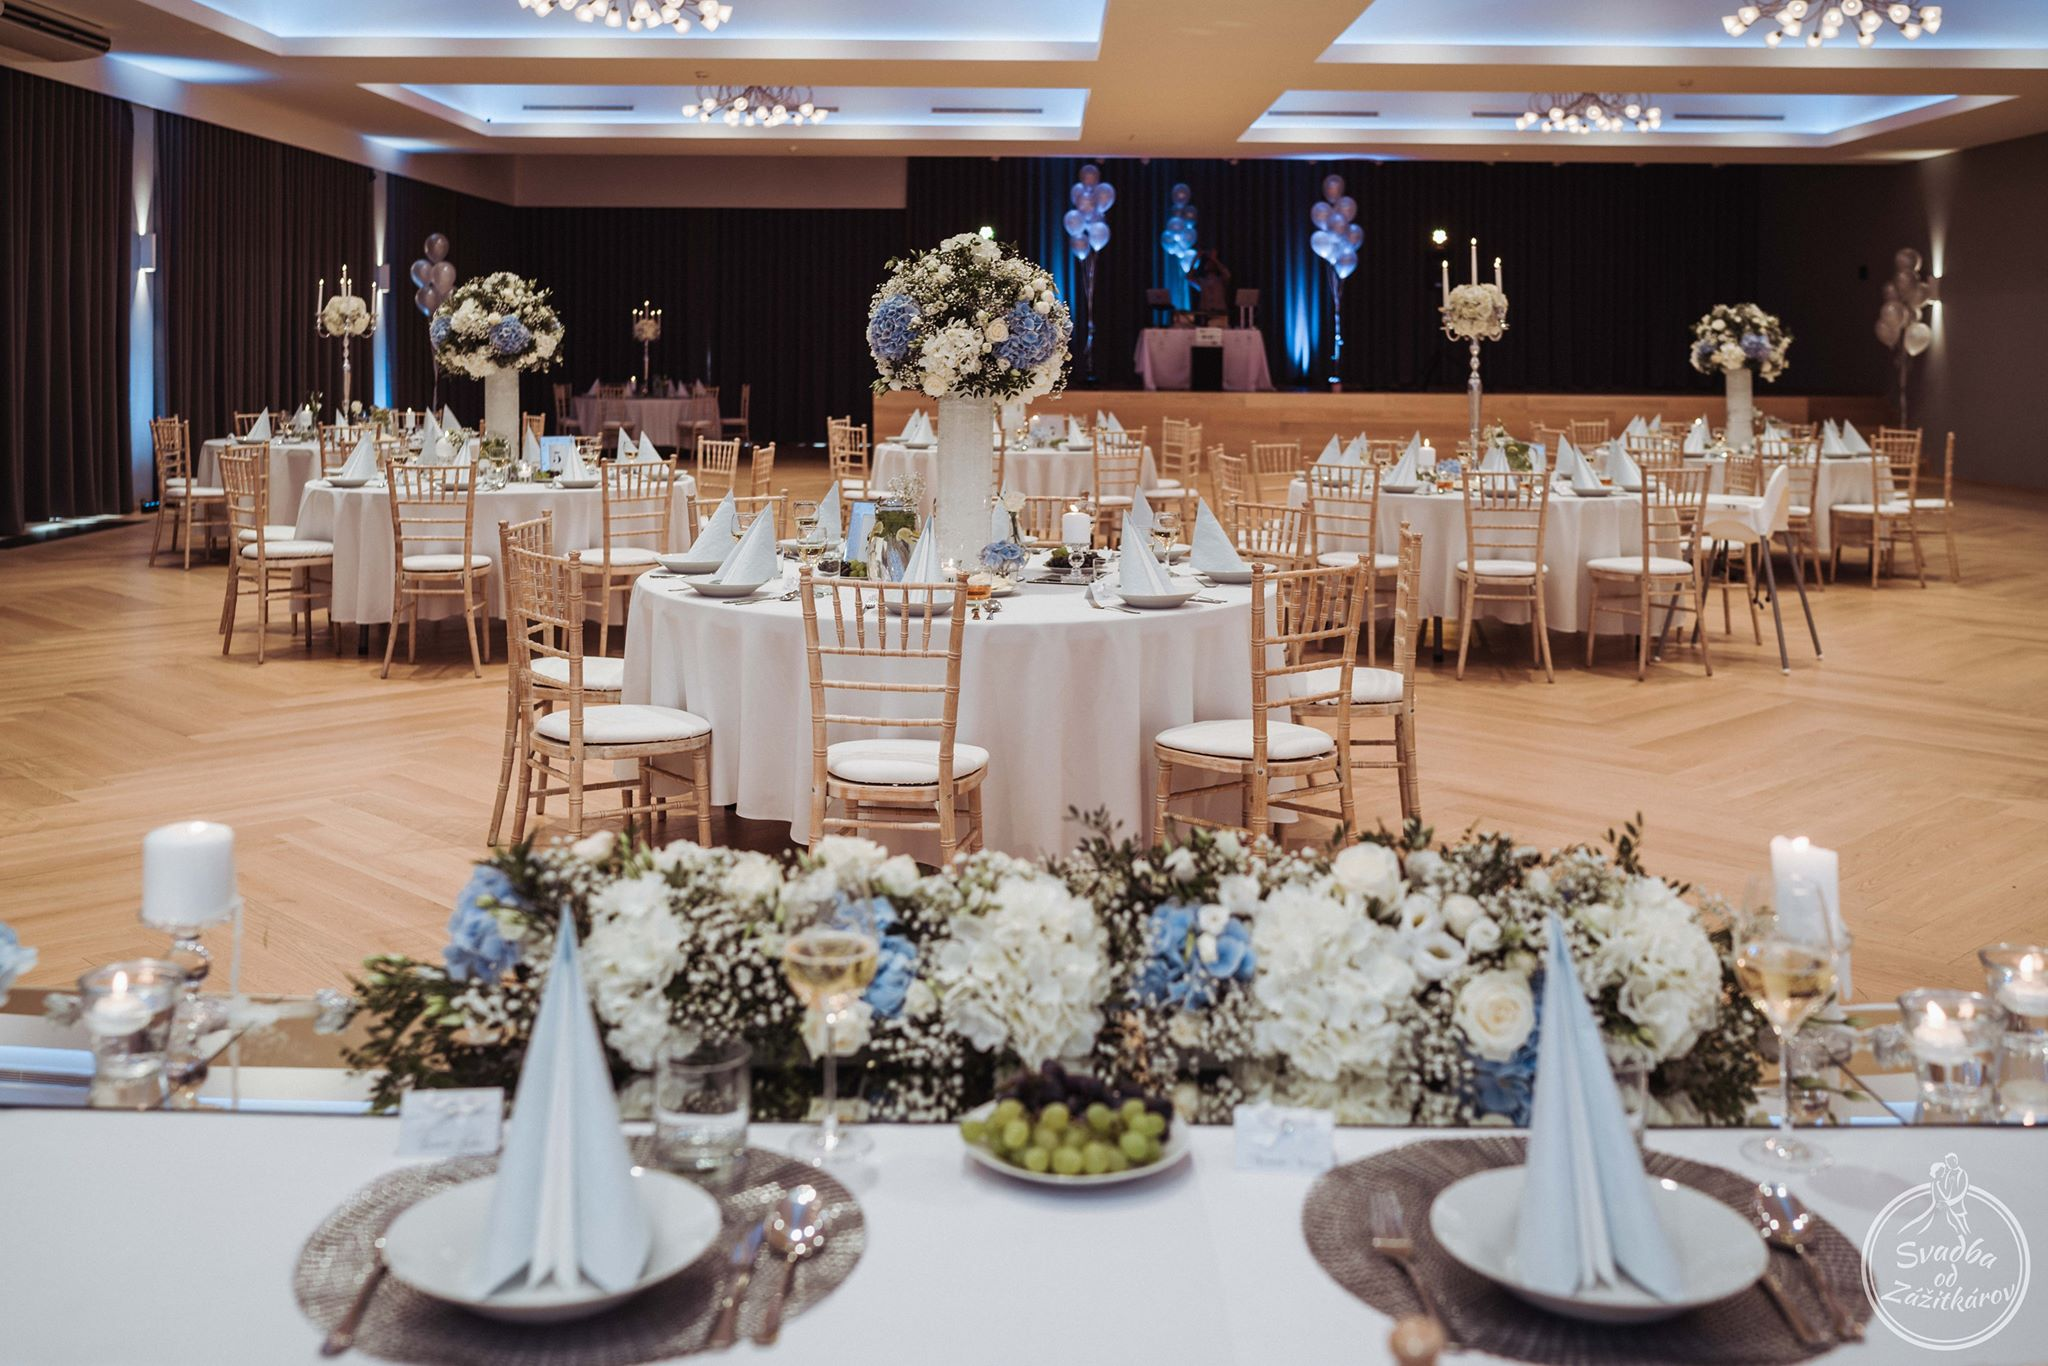 slovakia-wedding-zilina-modarate-starejsijpg